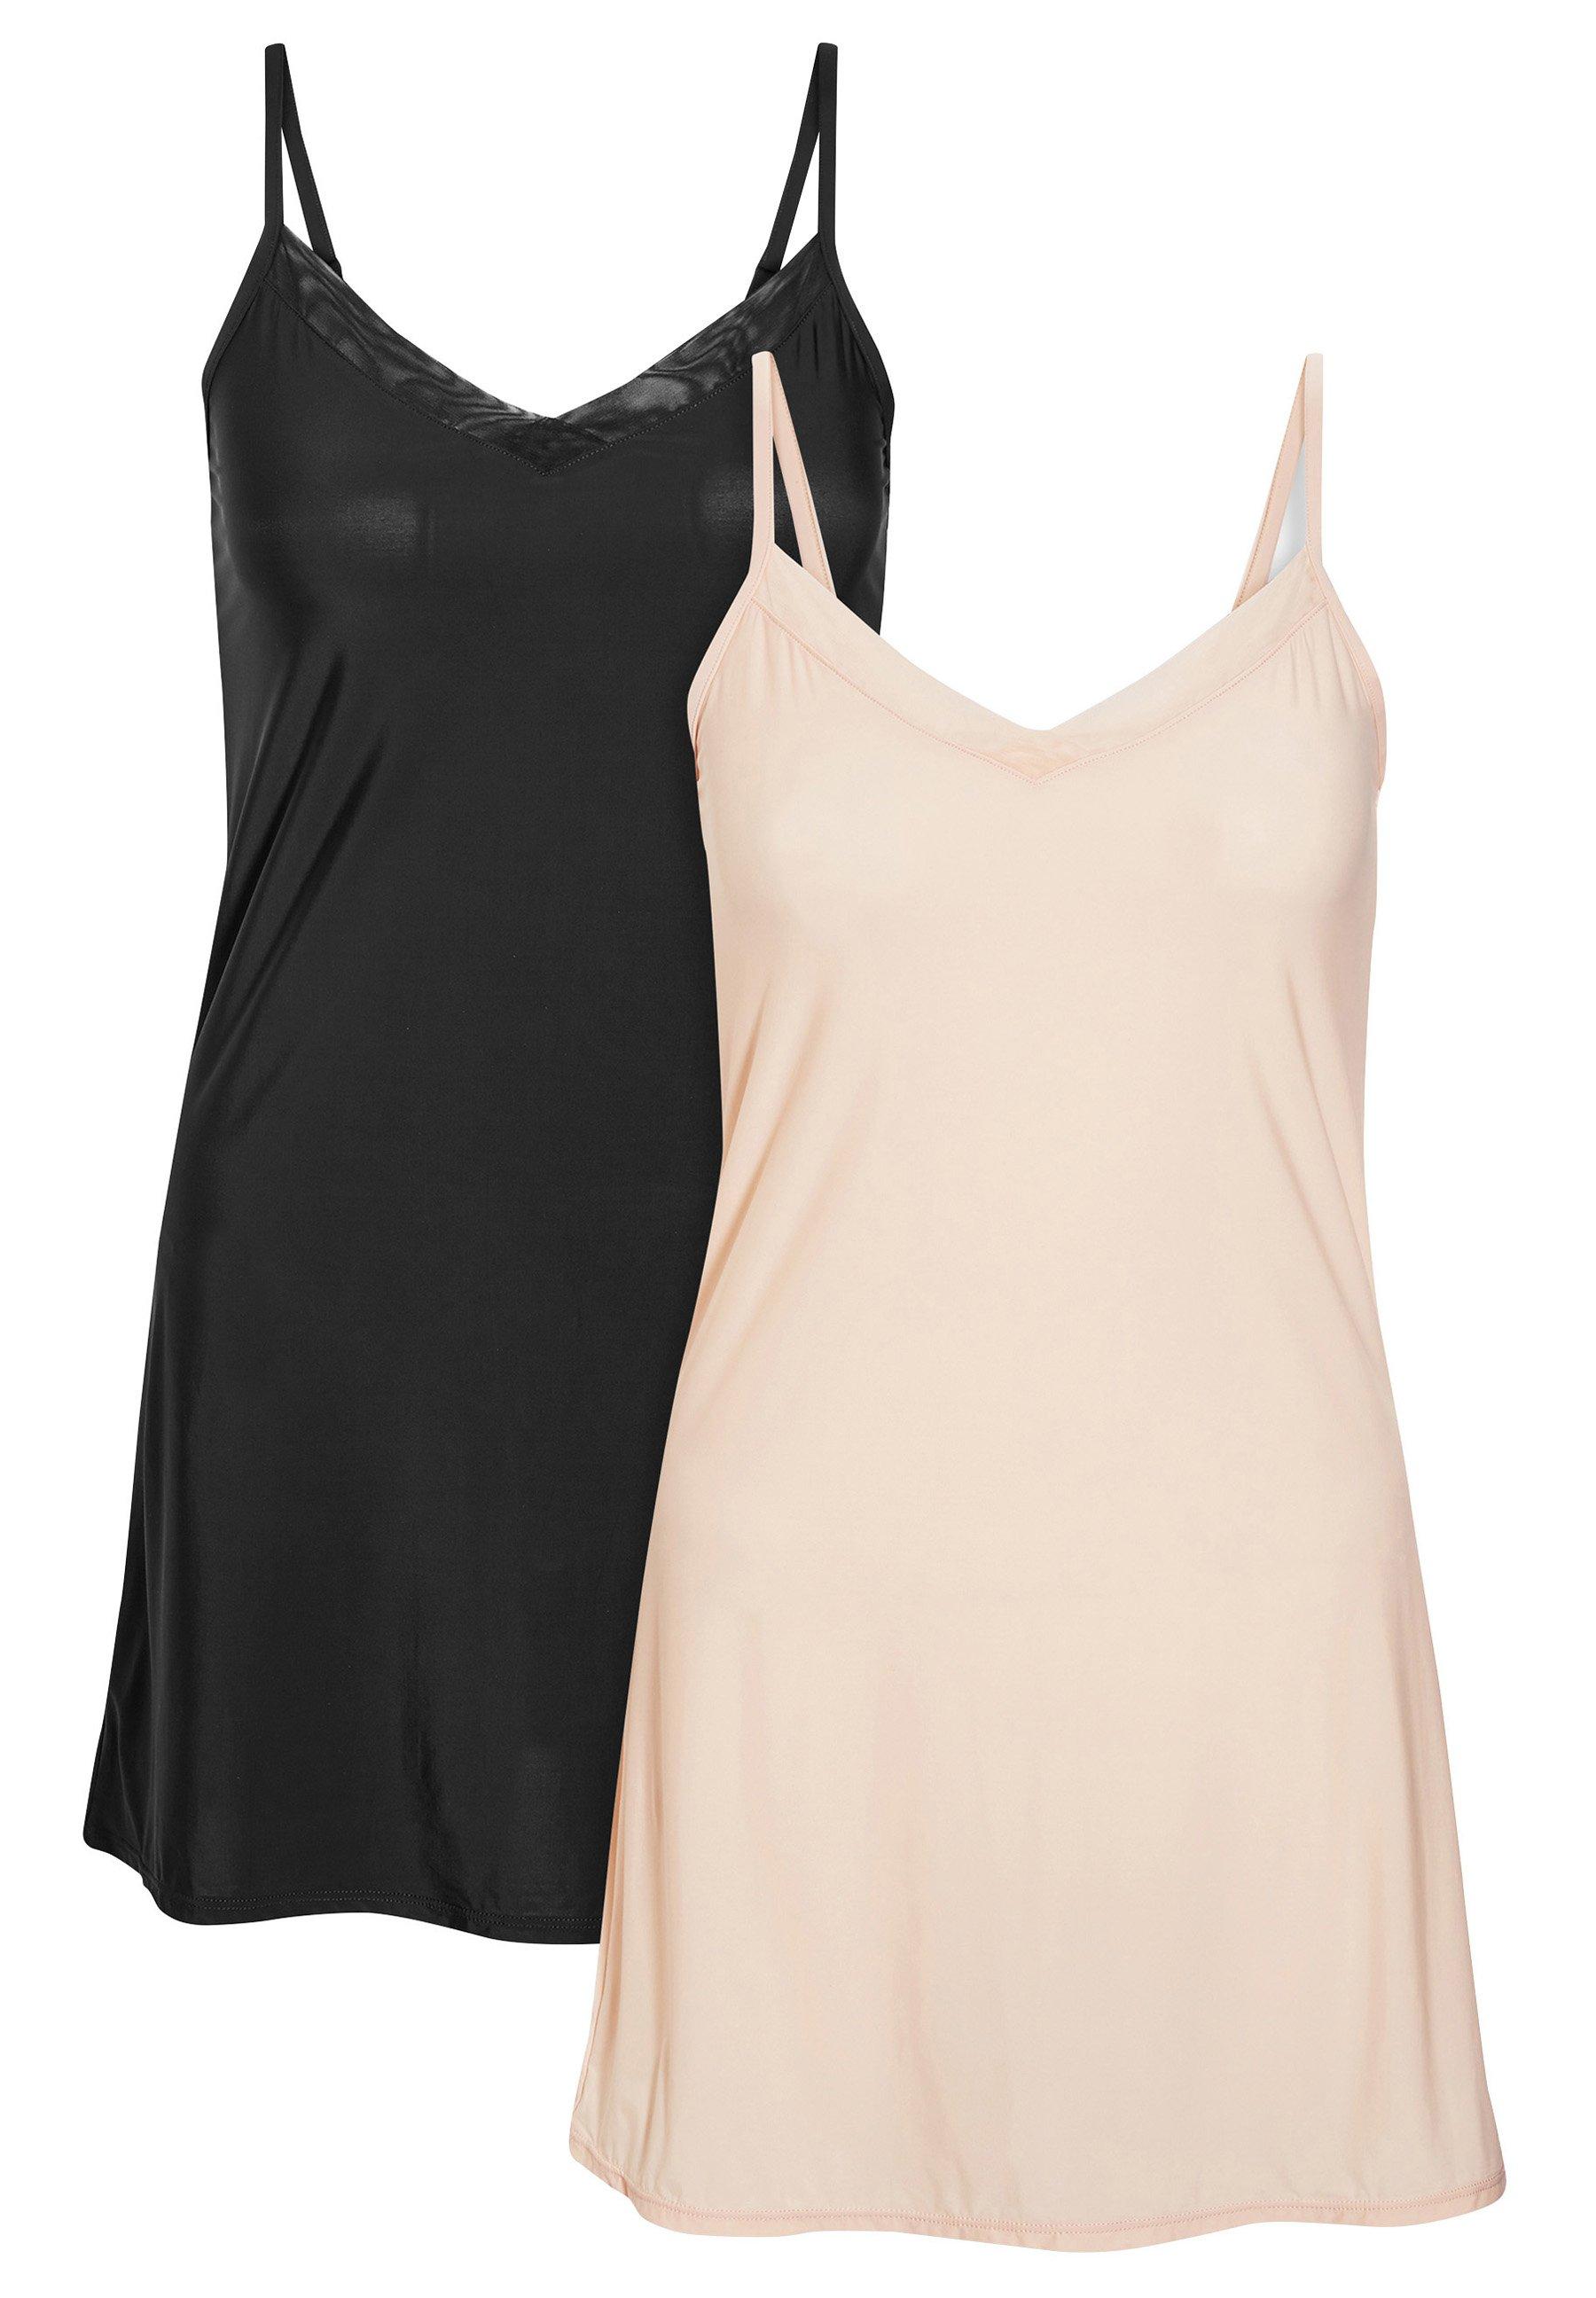 Damen SOFT MICROFIBRE SLIPS TWO PACK - Nachthemd